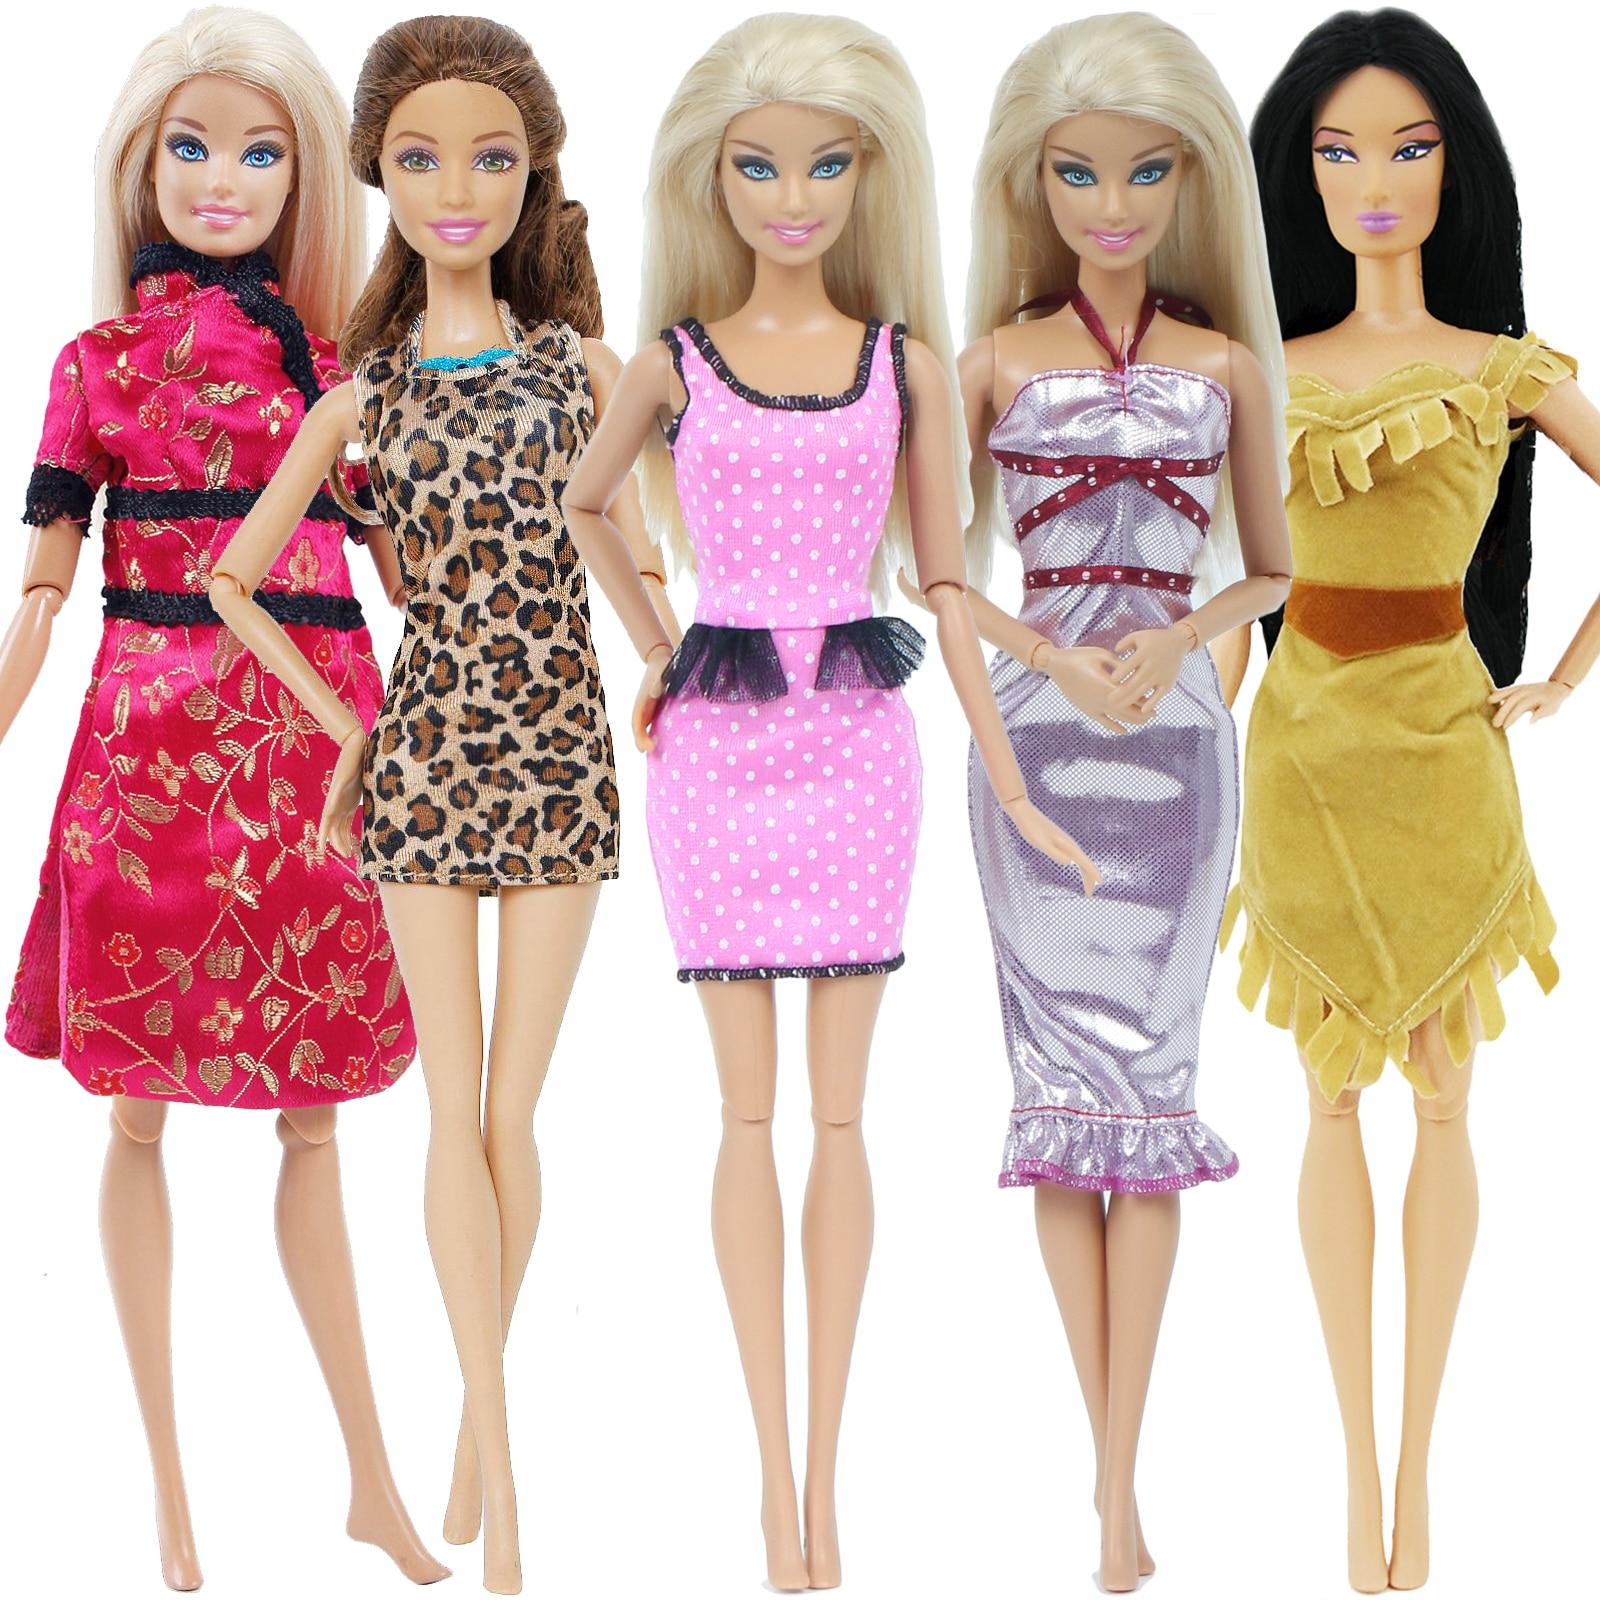 Handmade clothing Layers Skirt for 1:6 scale doll Barbie Blythe # polka dot A-10